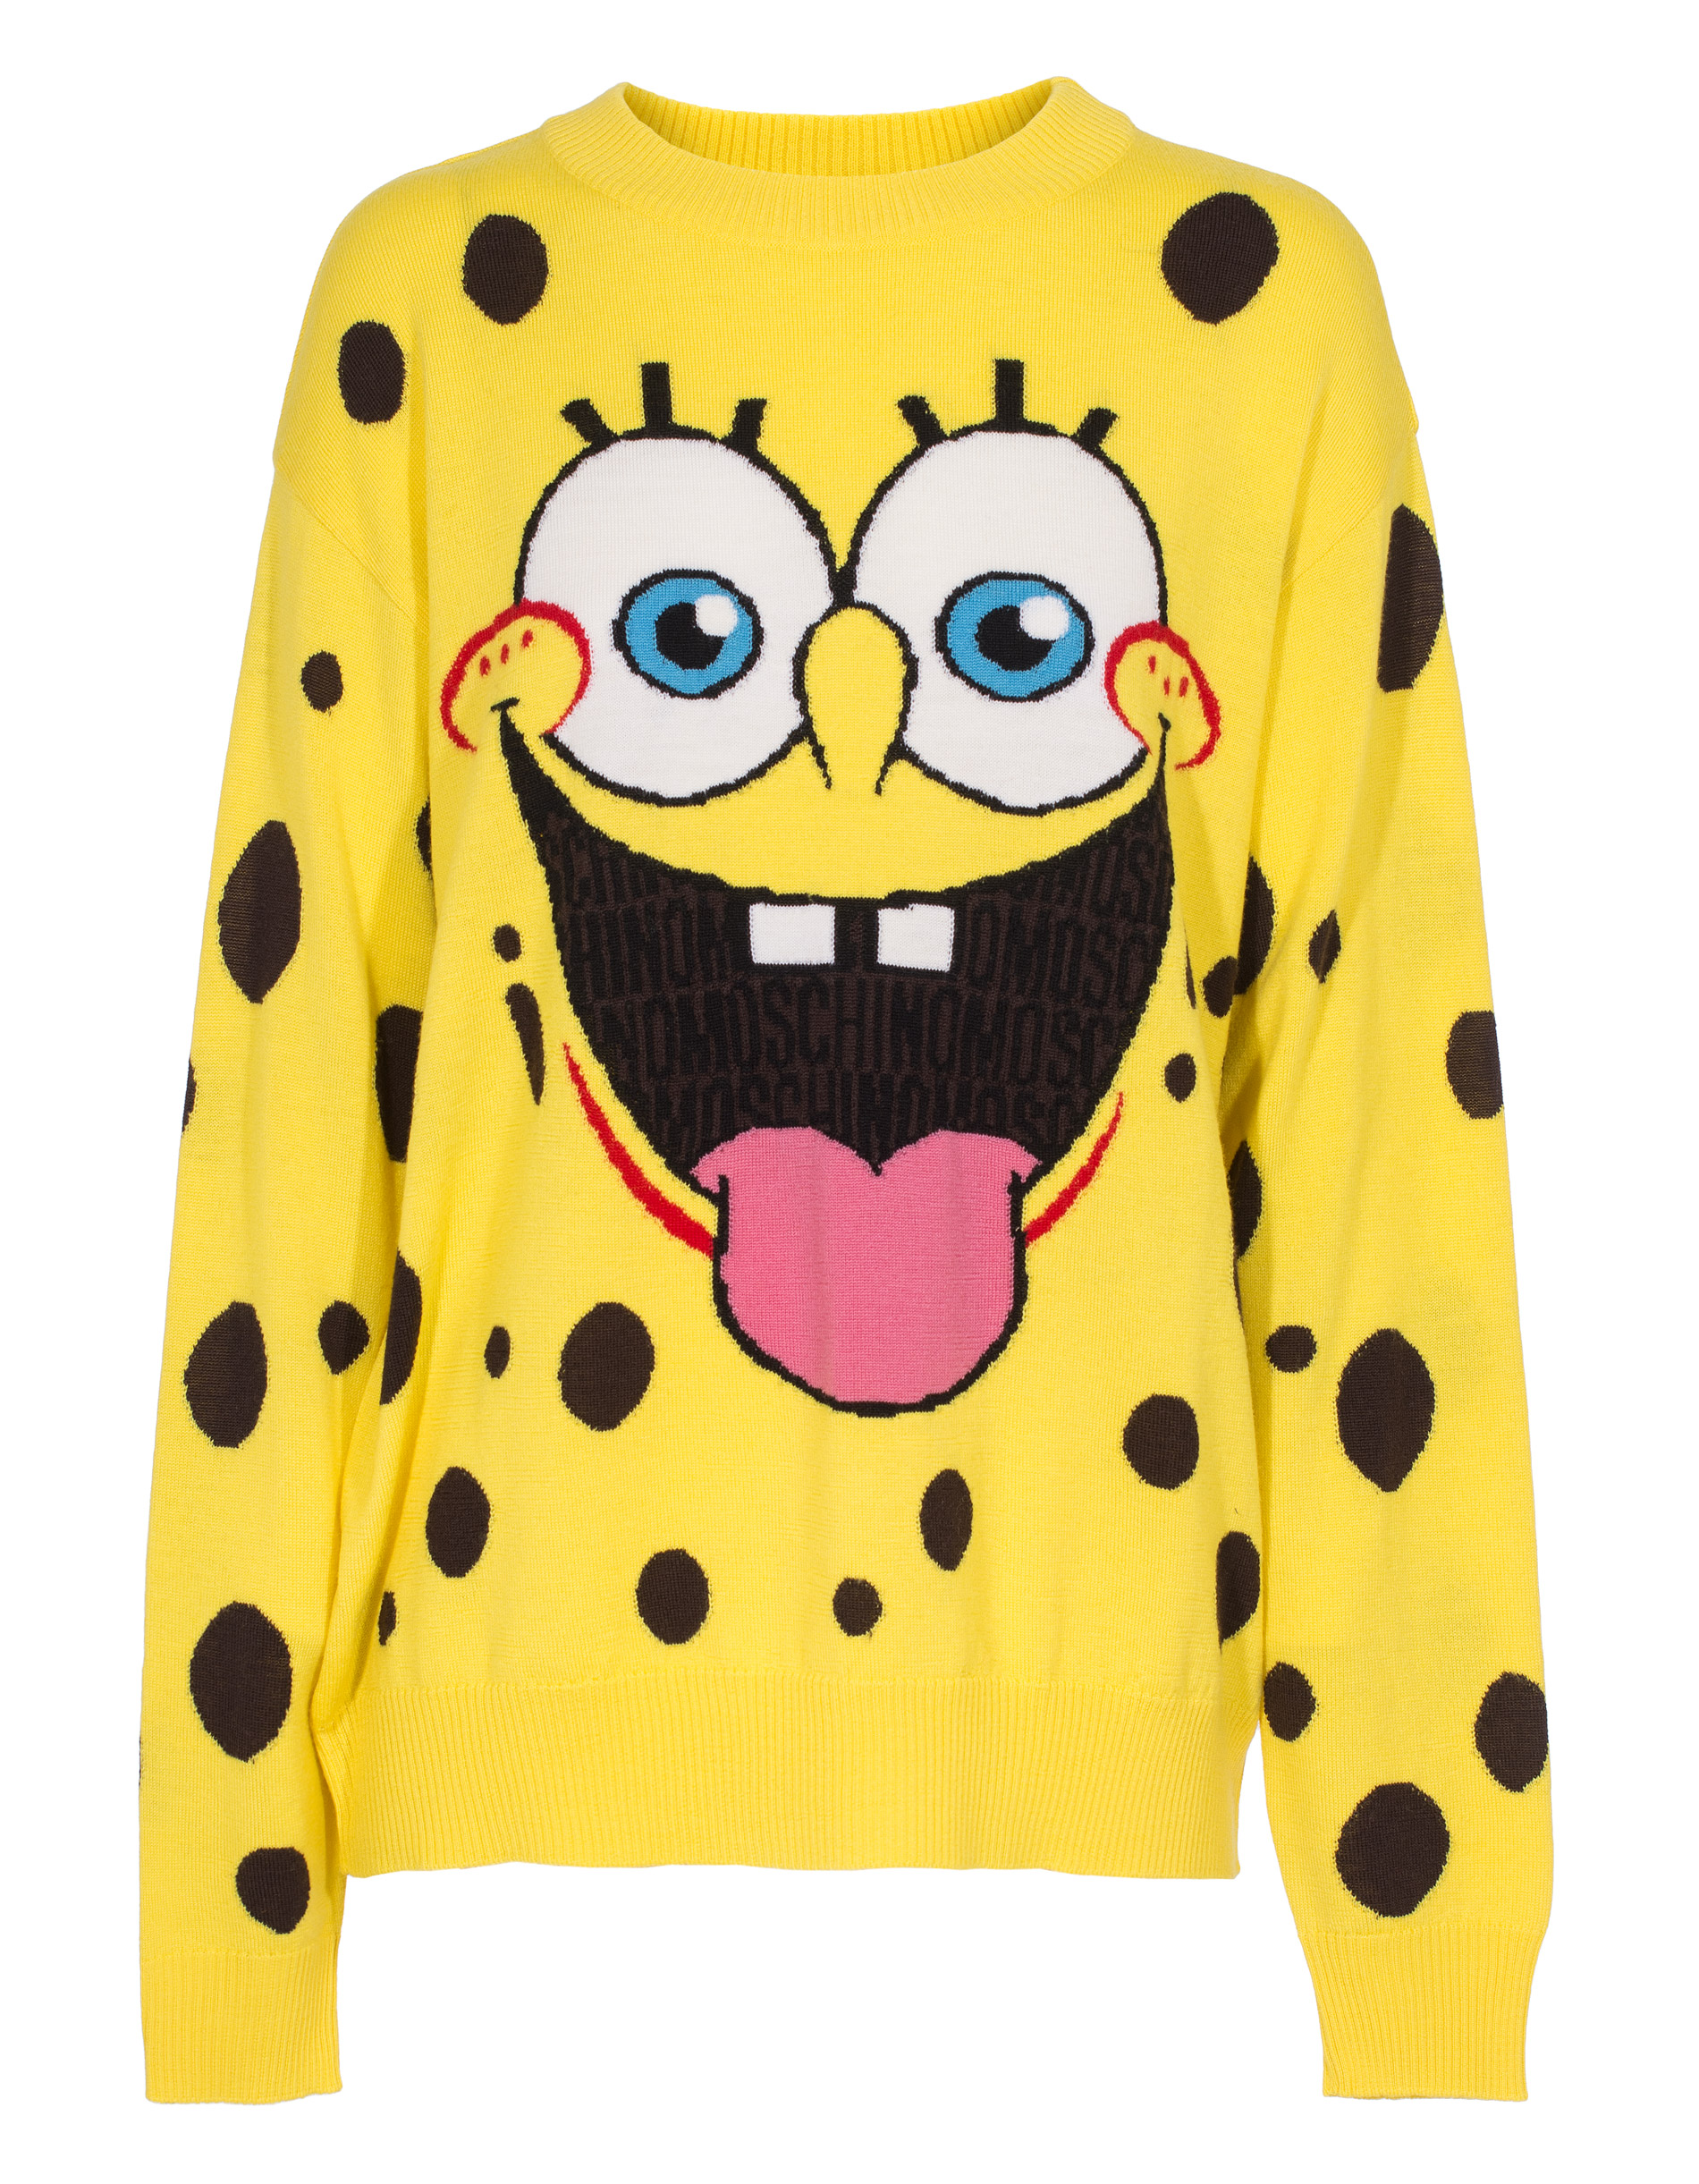 Spongebob Sweater On The Hunt